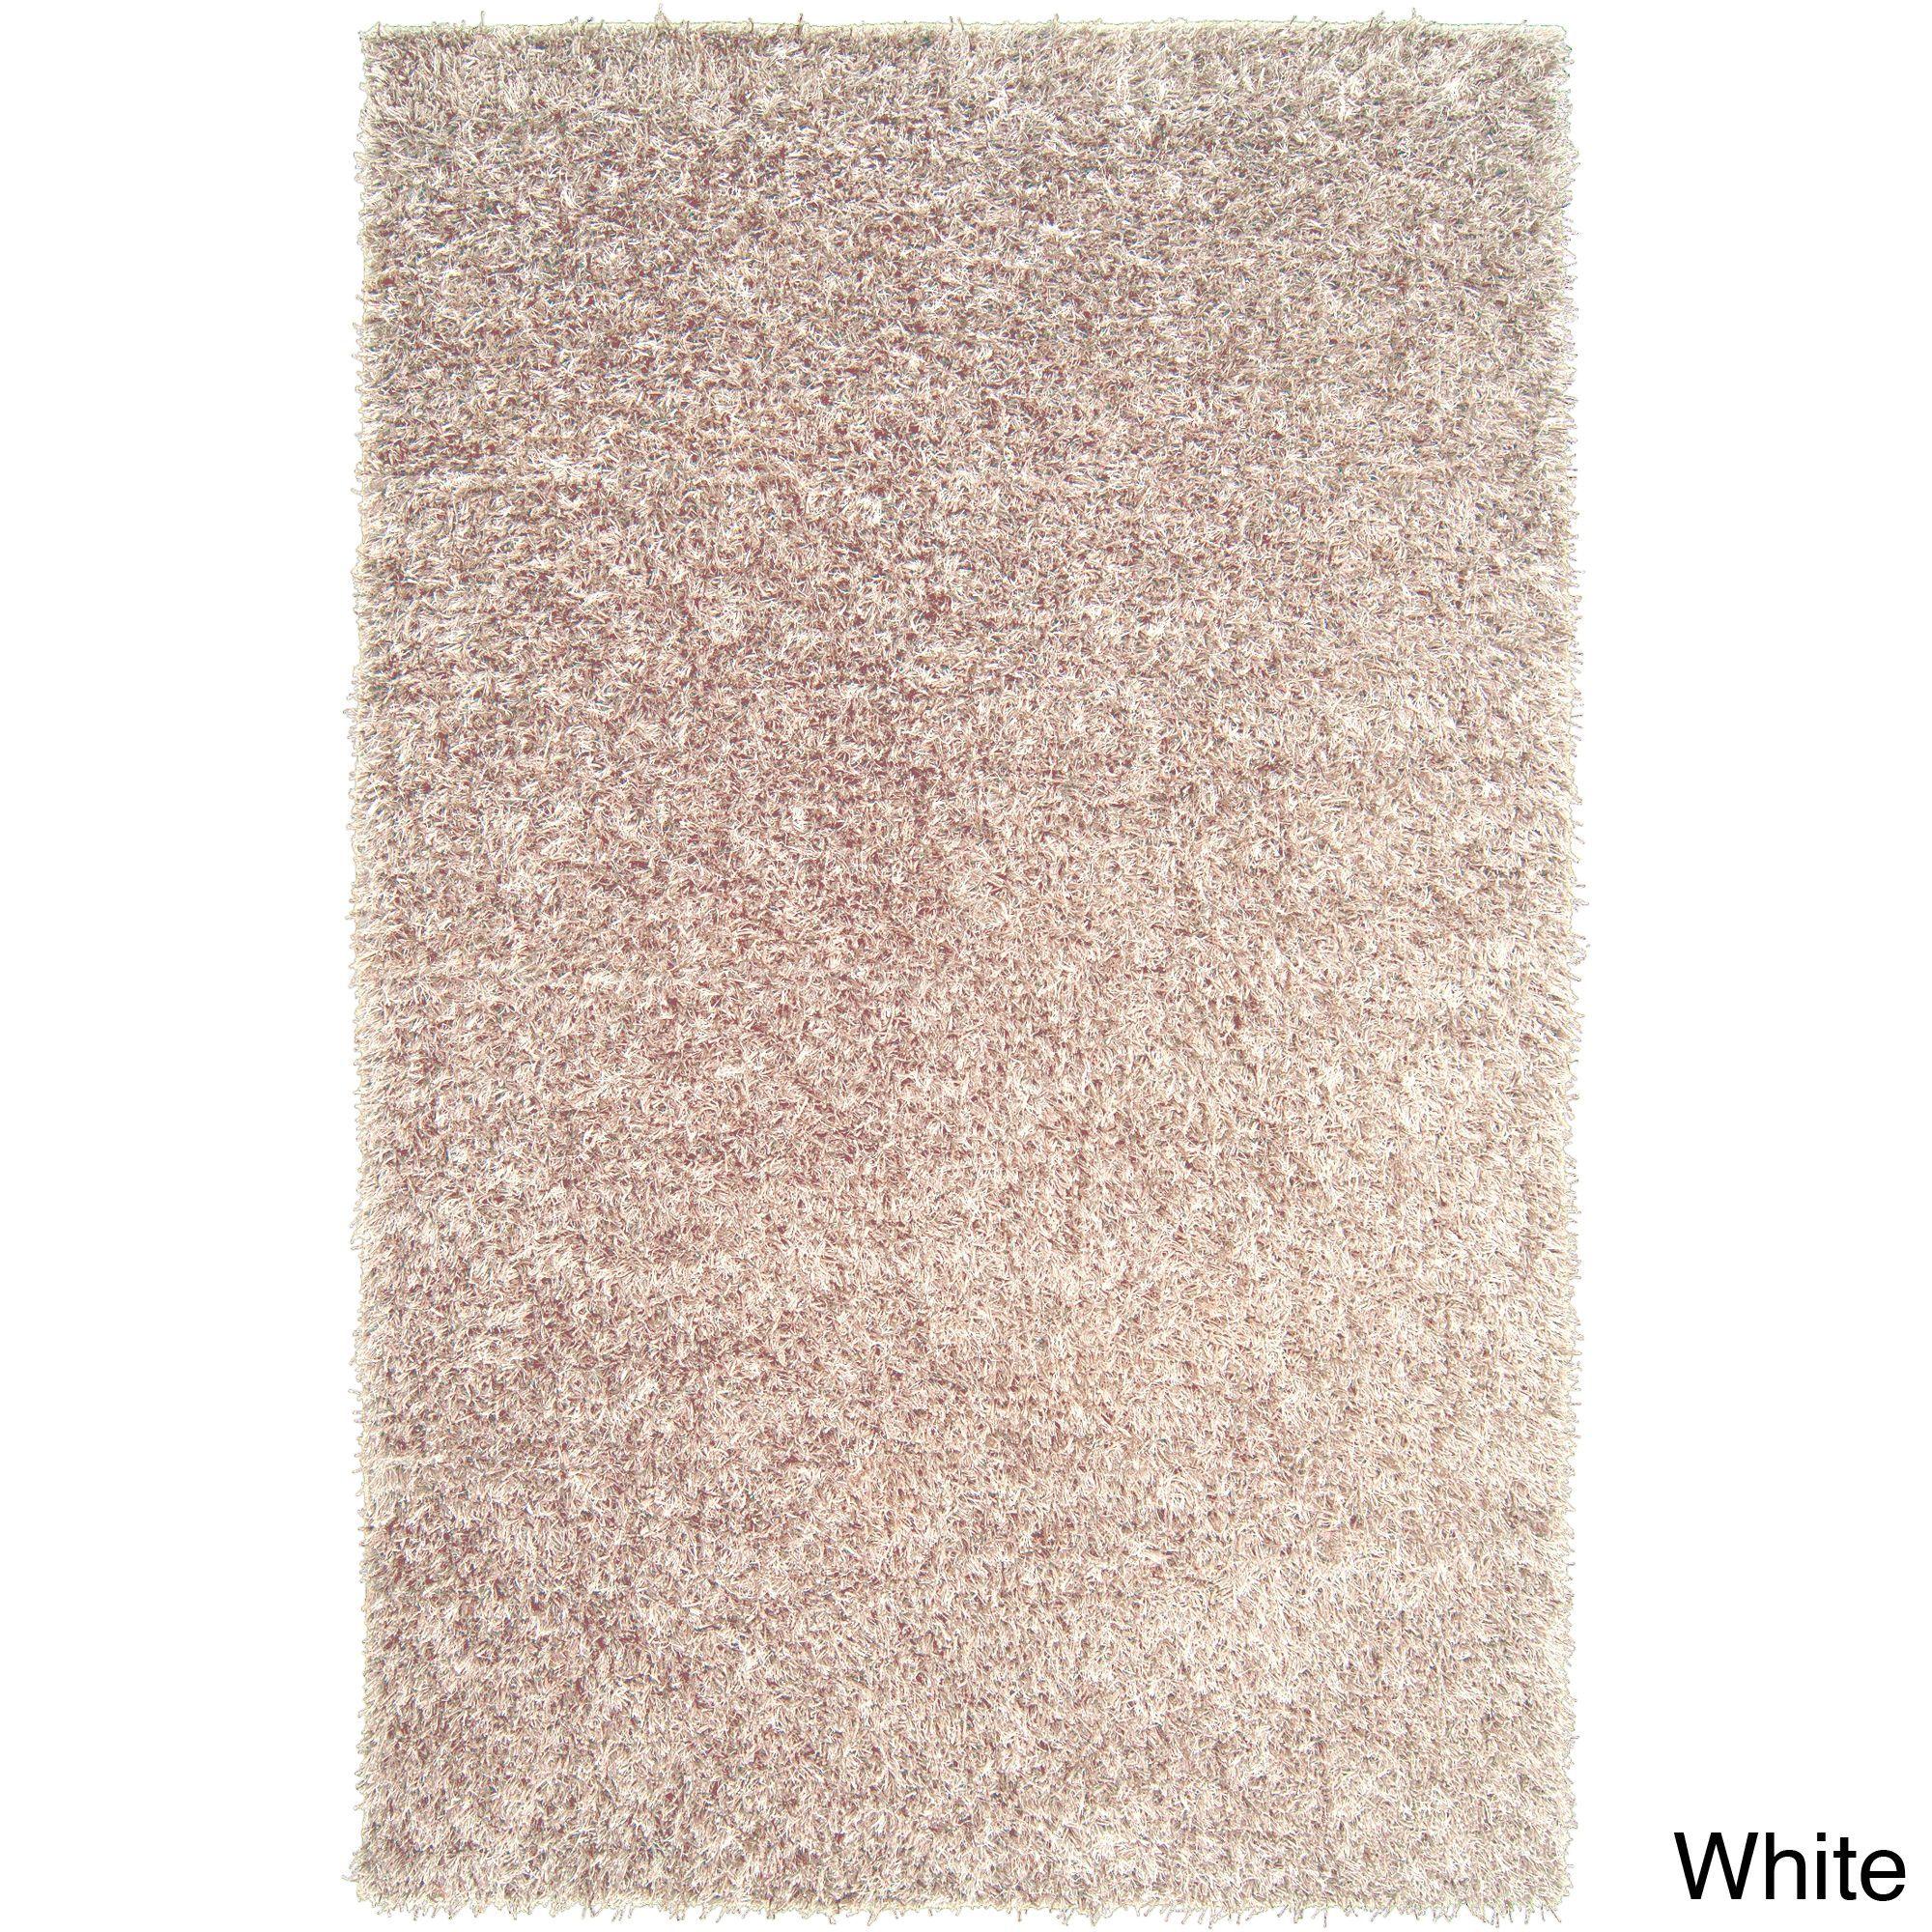 Hand-woven Benton Soft Plush Shag Rug (White-(2' x 3')), White, Size 2' x 3' (Polyester, Solid)